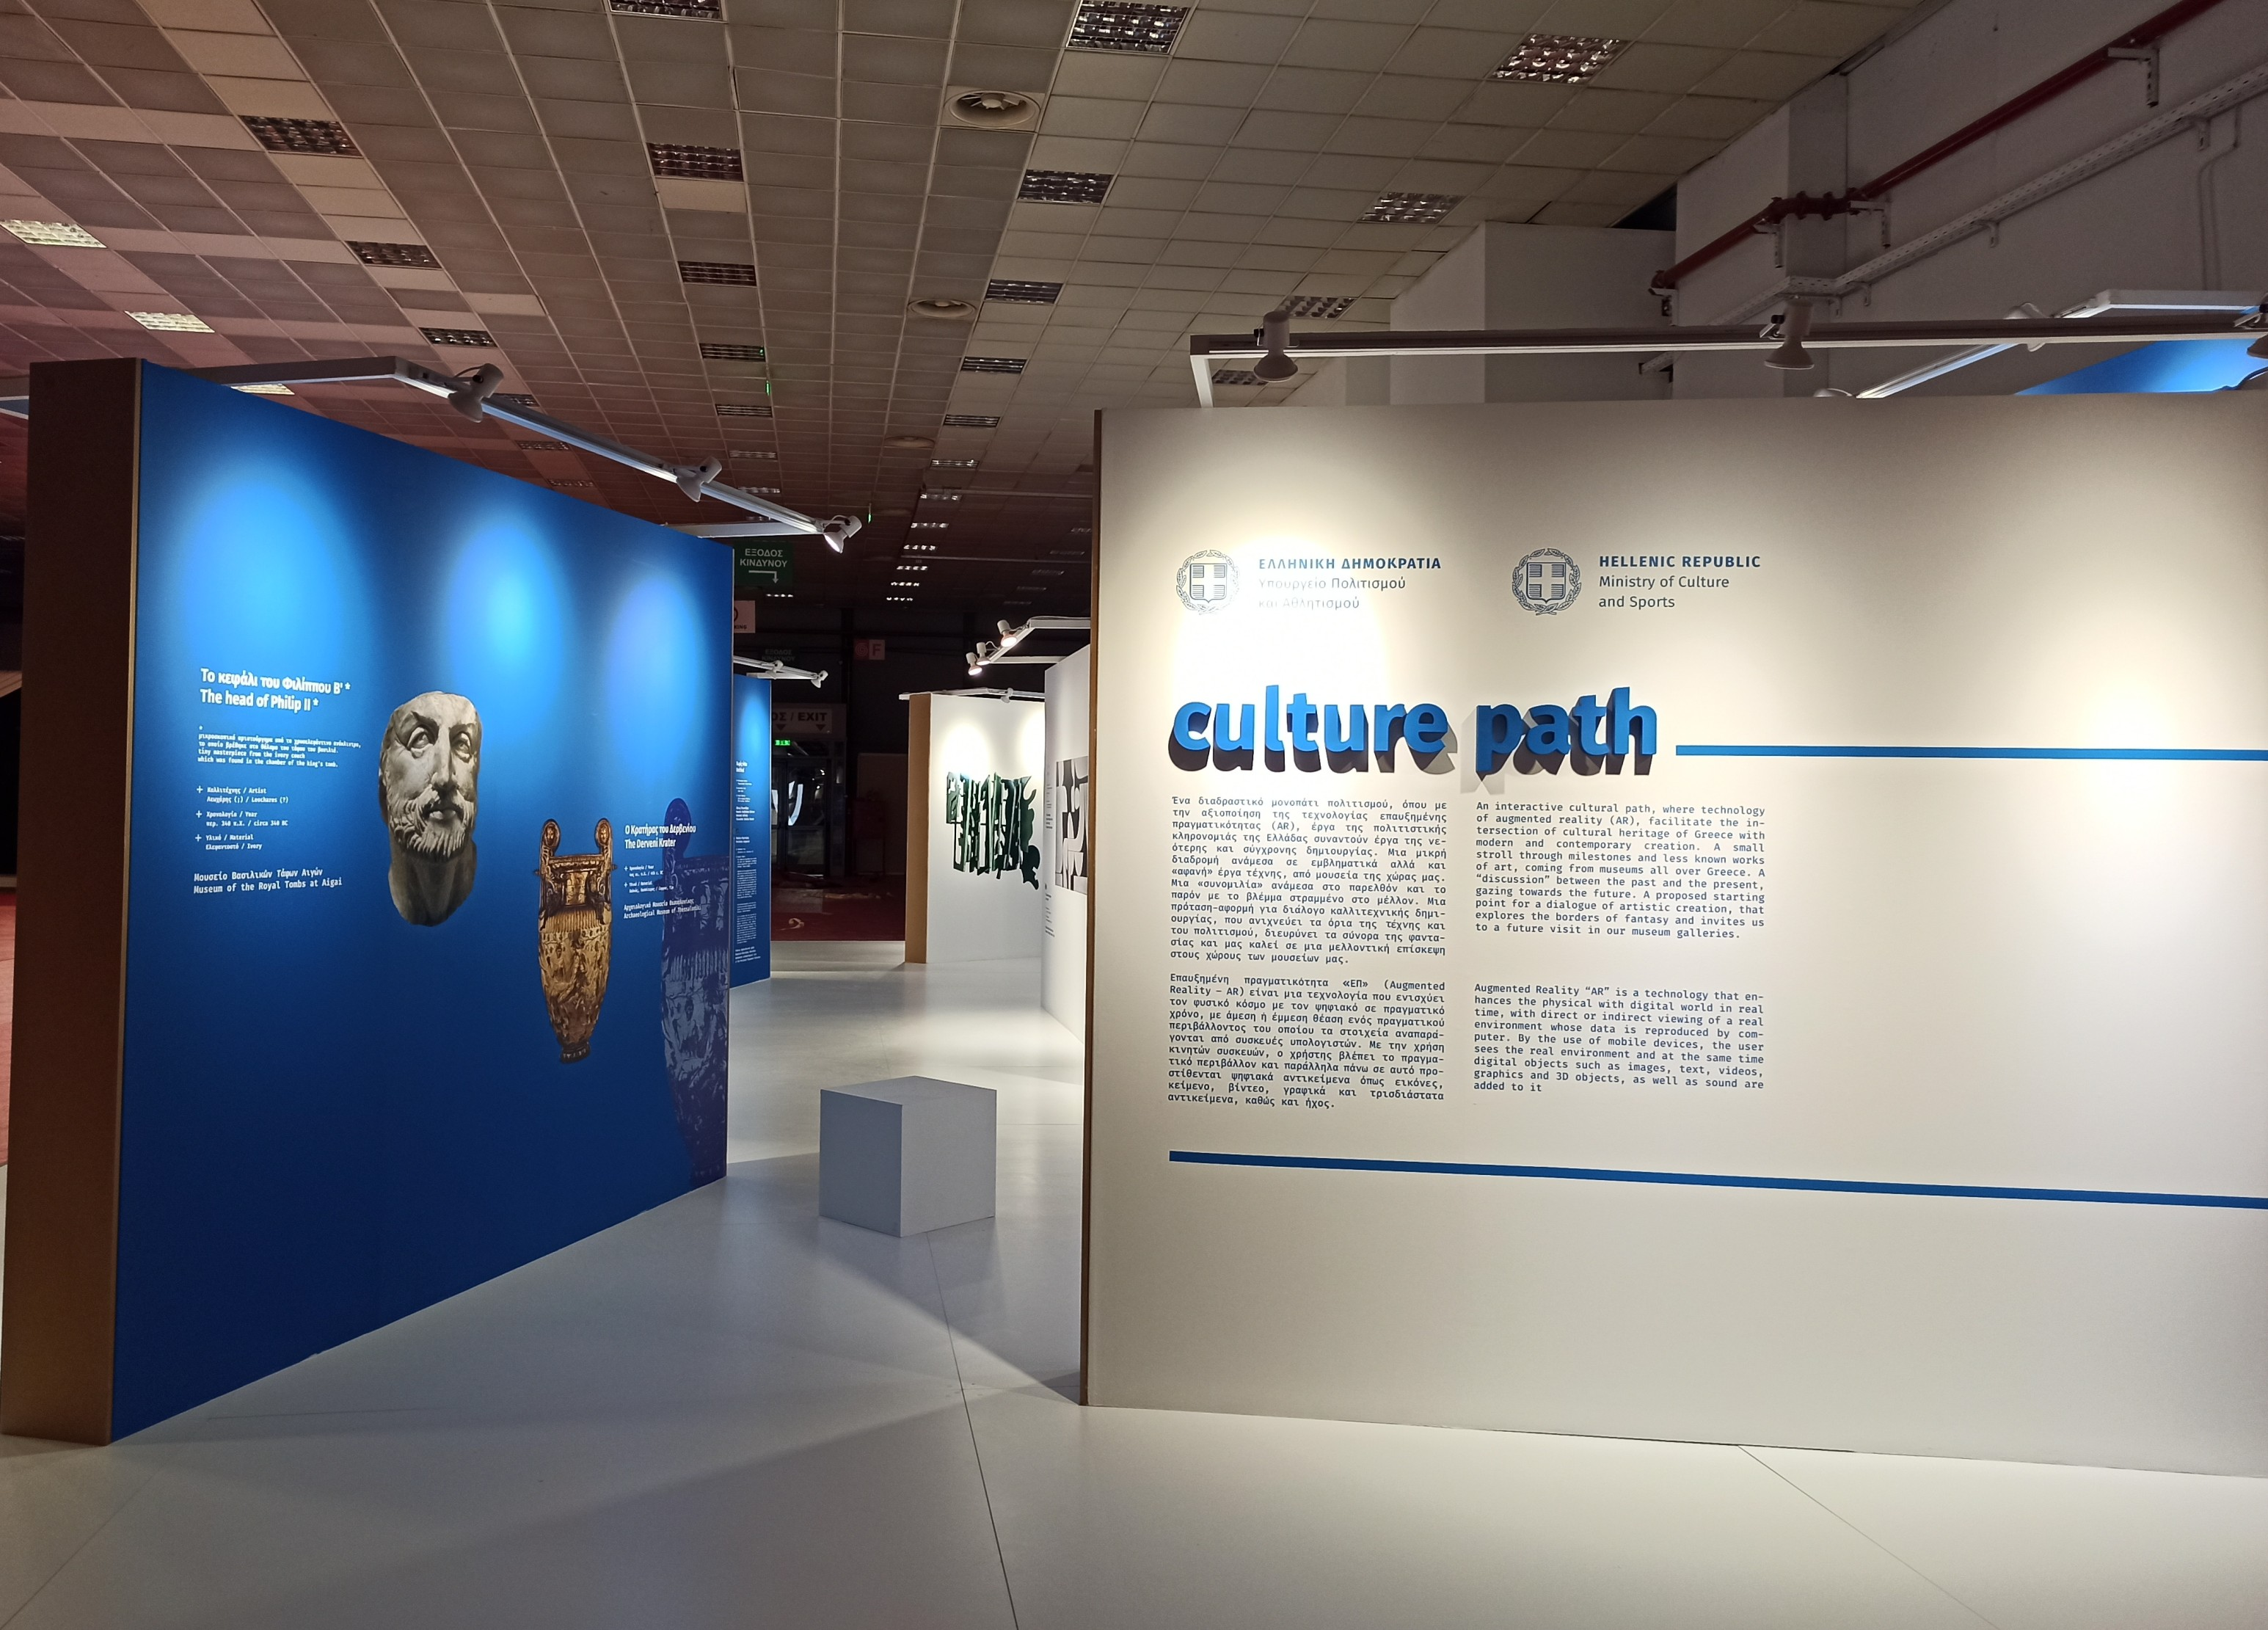 CULTURE PATH AR | Μια Διαδραστική Περιήγηση στο Περίπτερο του Υπουργείου Πολιτισμού για την 85η ΔΕΘ